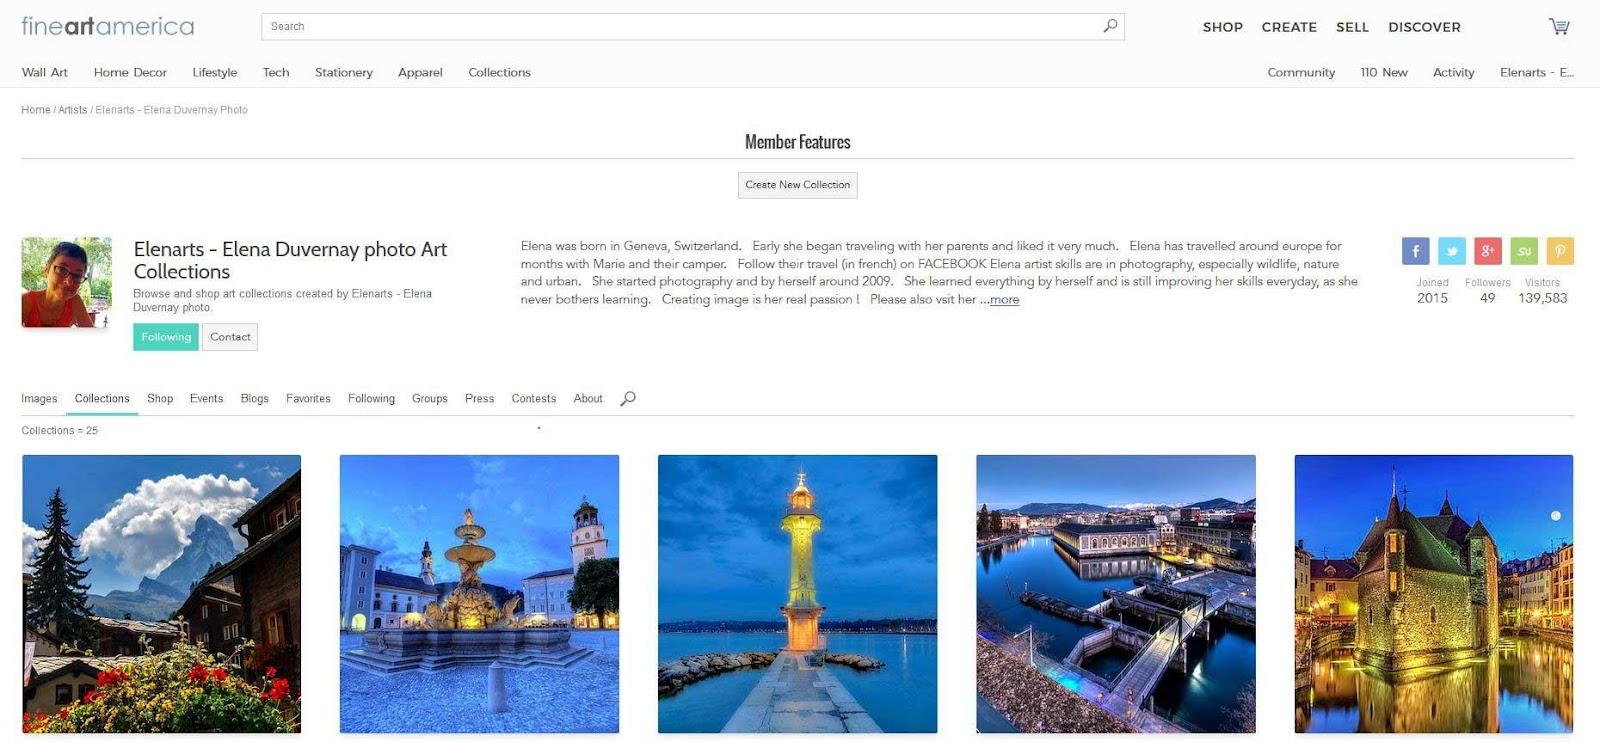 Profile FineArtAmerica | Vendre ses photos en ligne